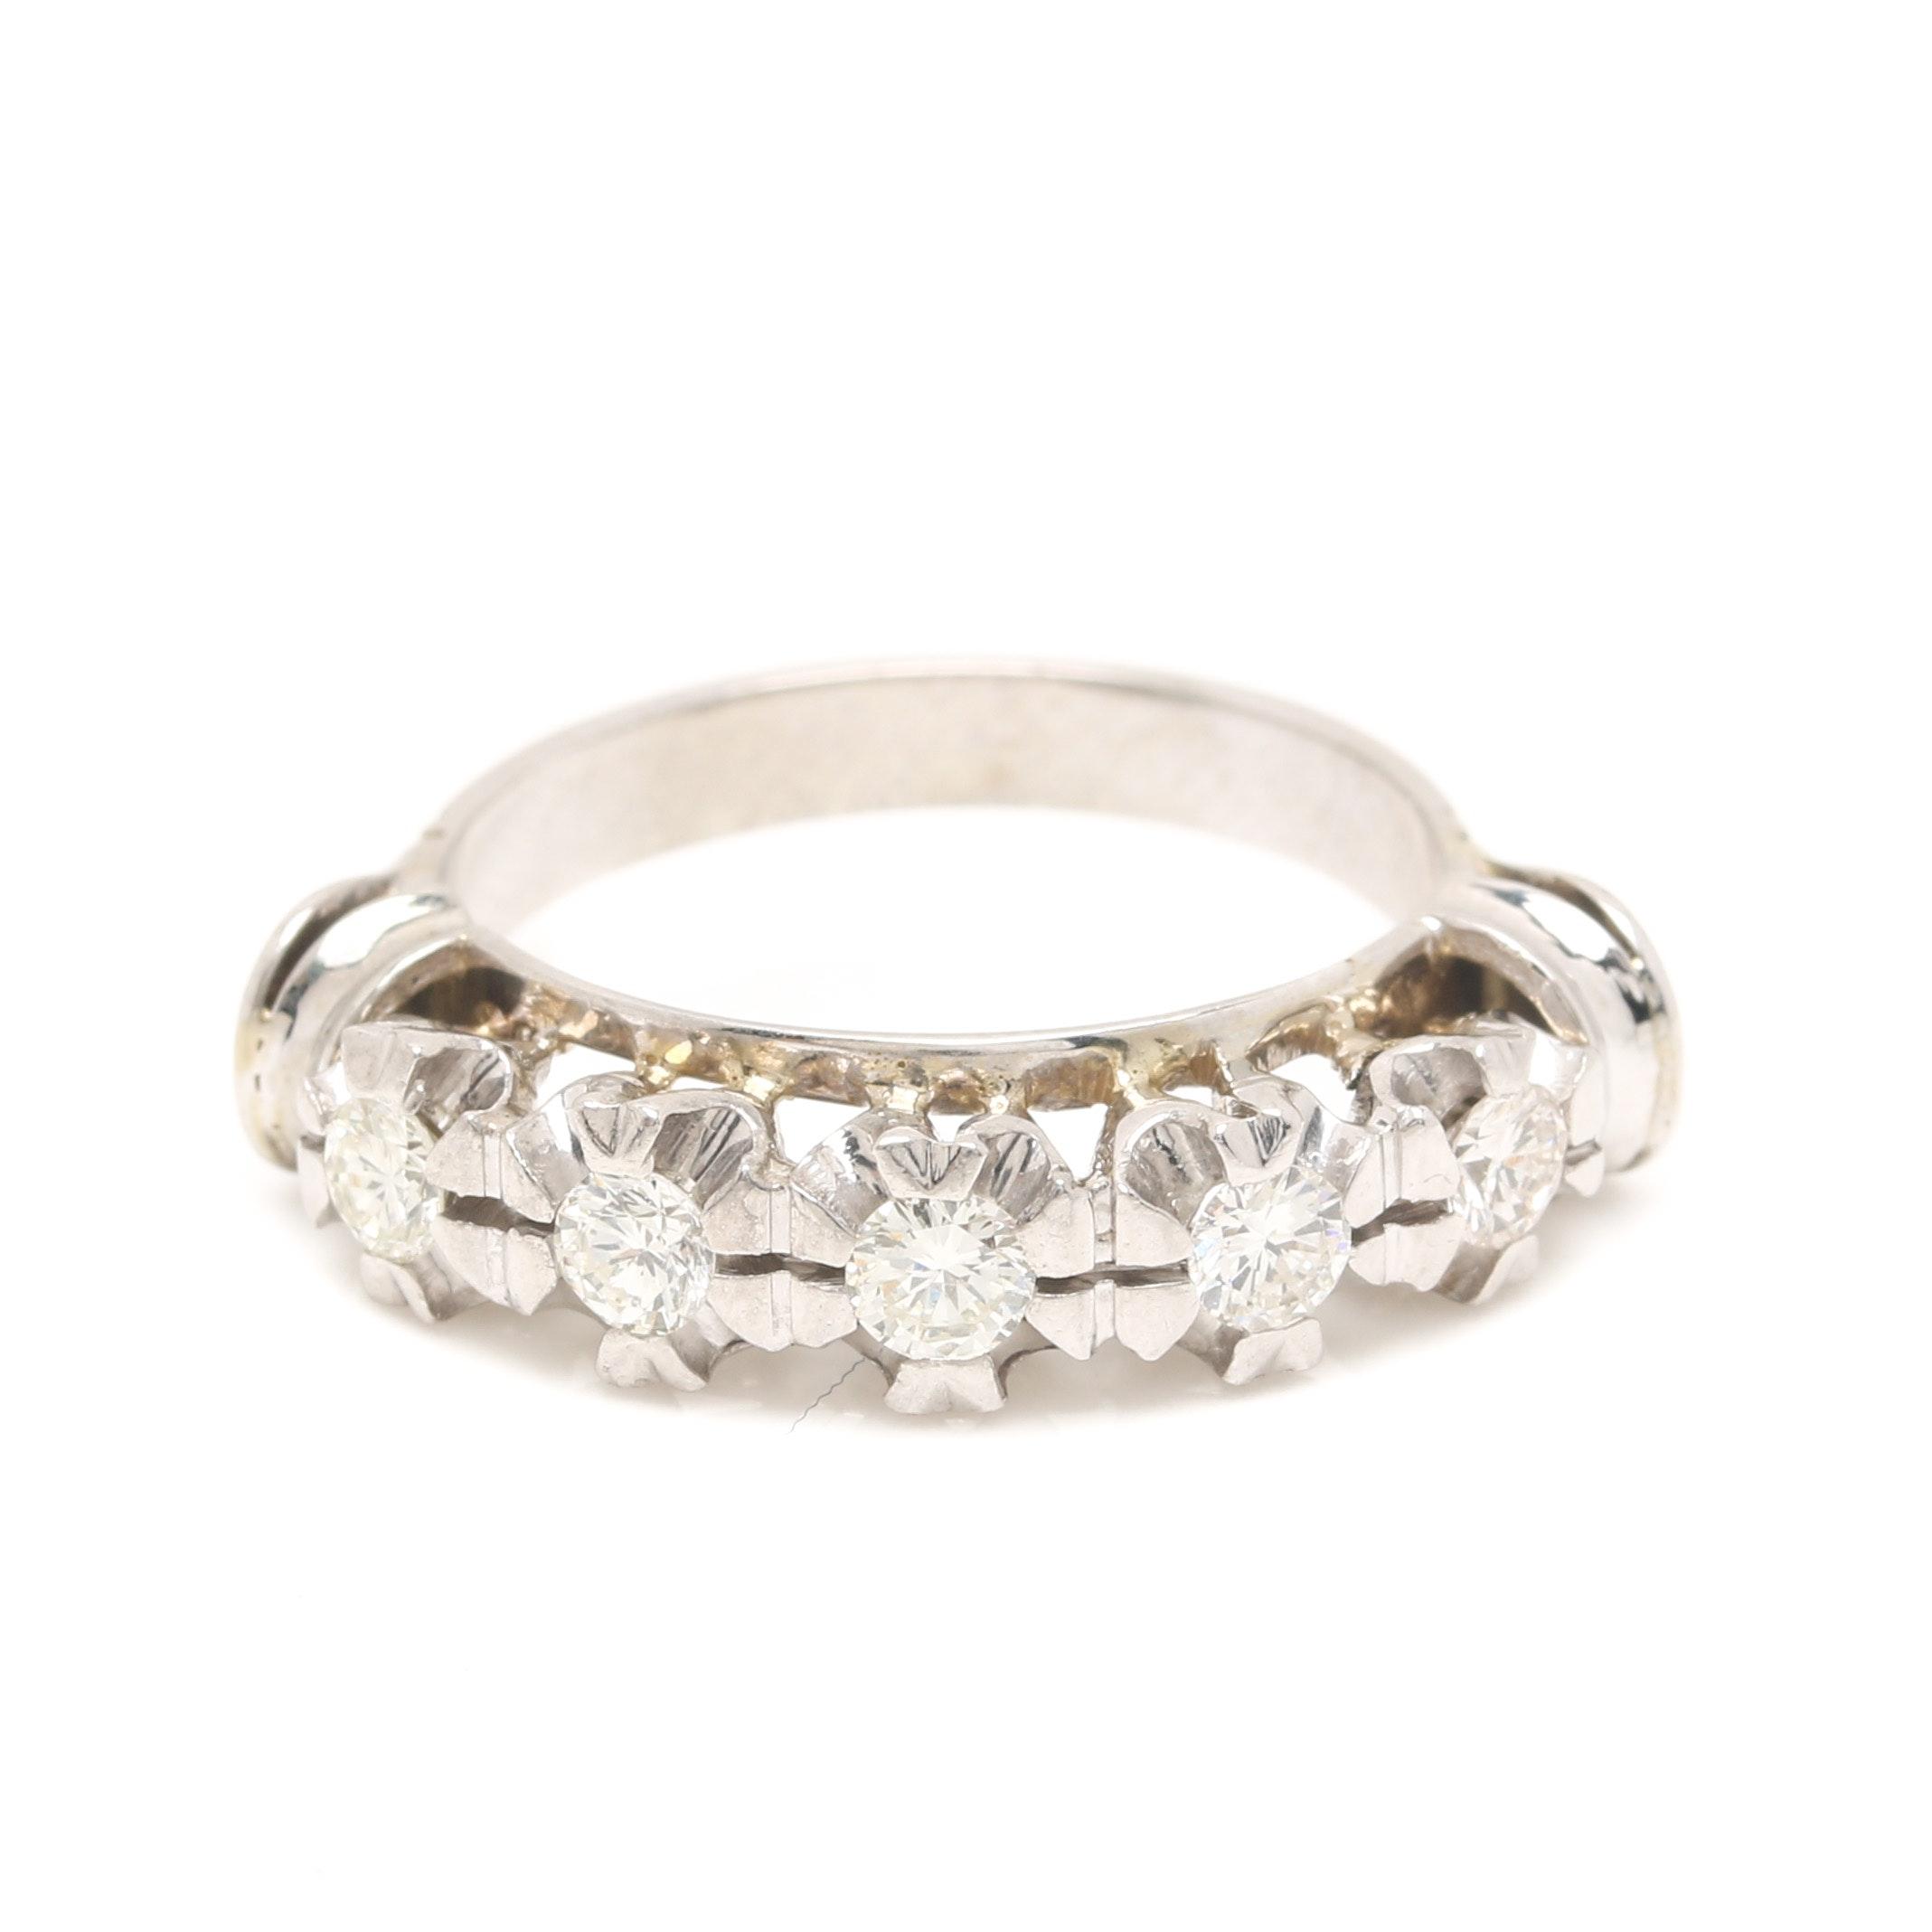 14K and 18K White Gold Diamond Ring